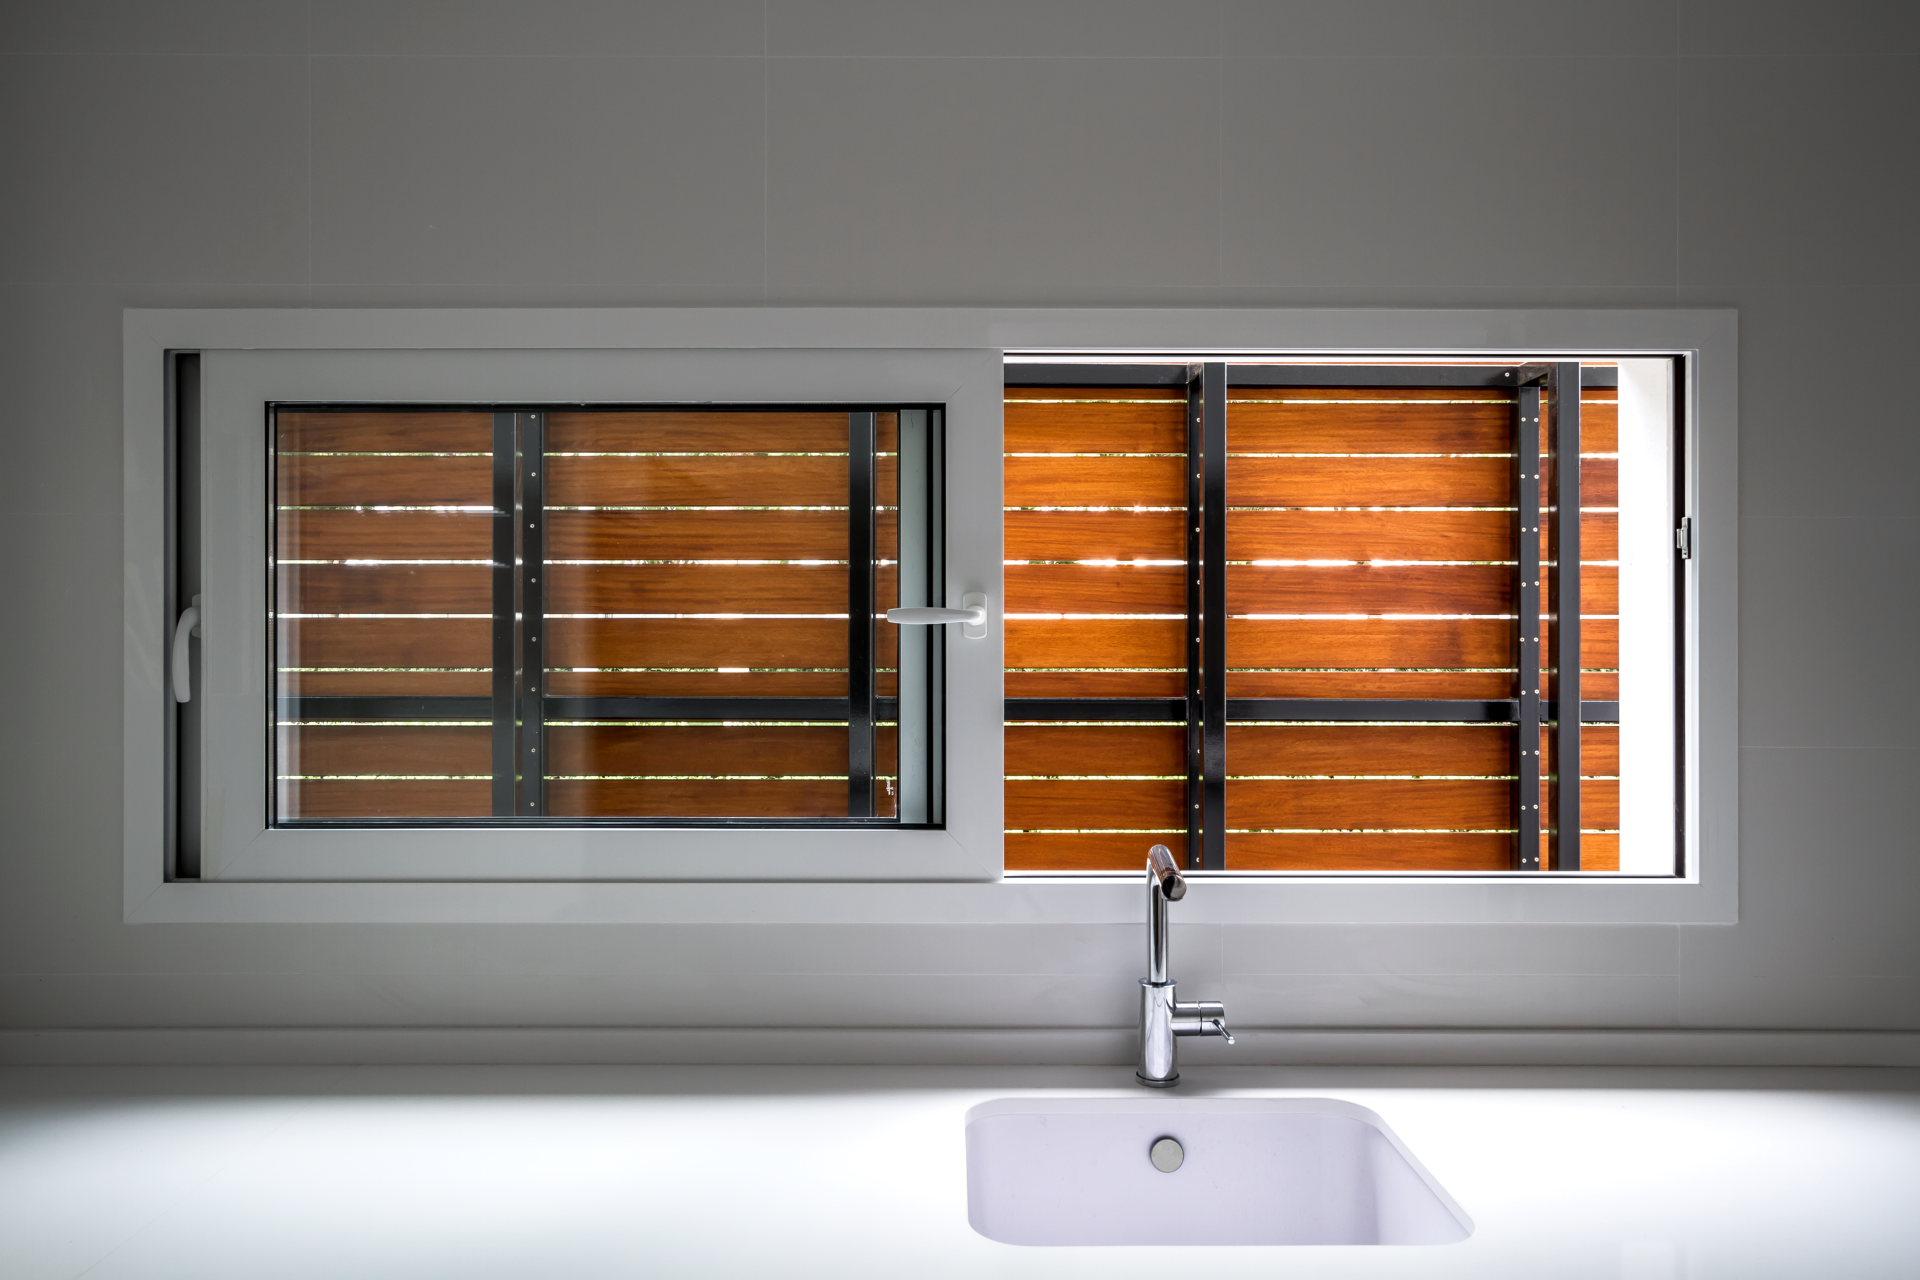 fotografia-arquitectura-valencia-german-cabo-viraje-museros (10)